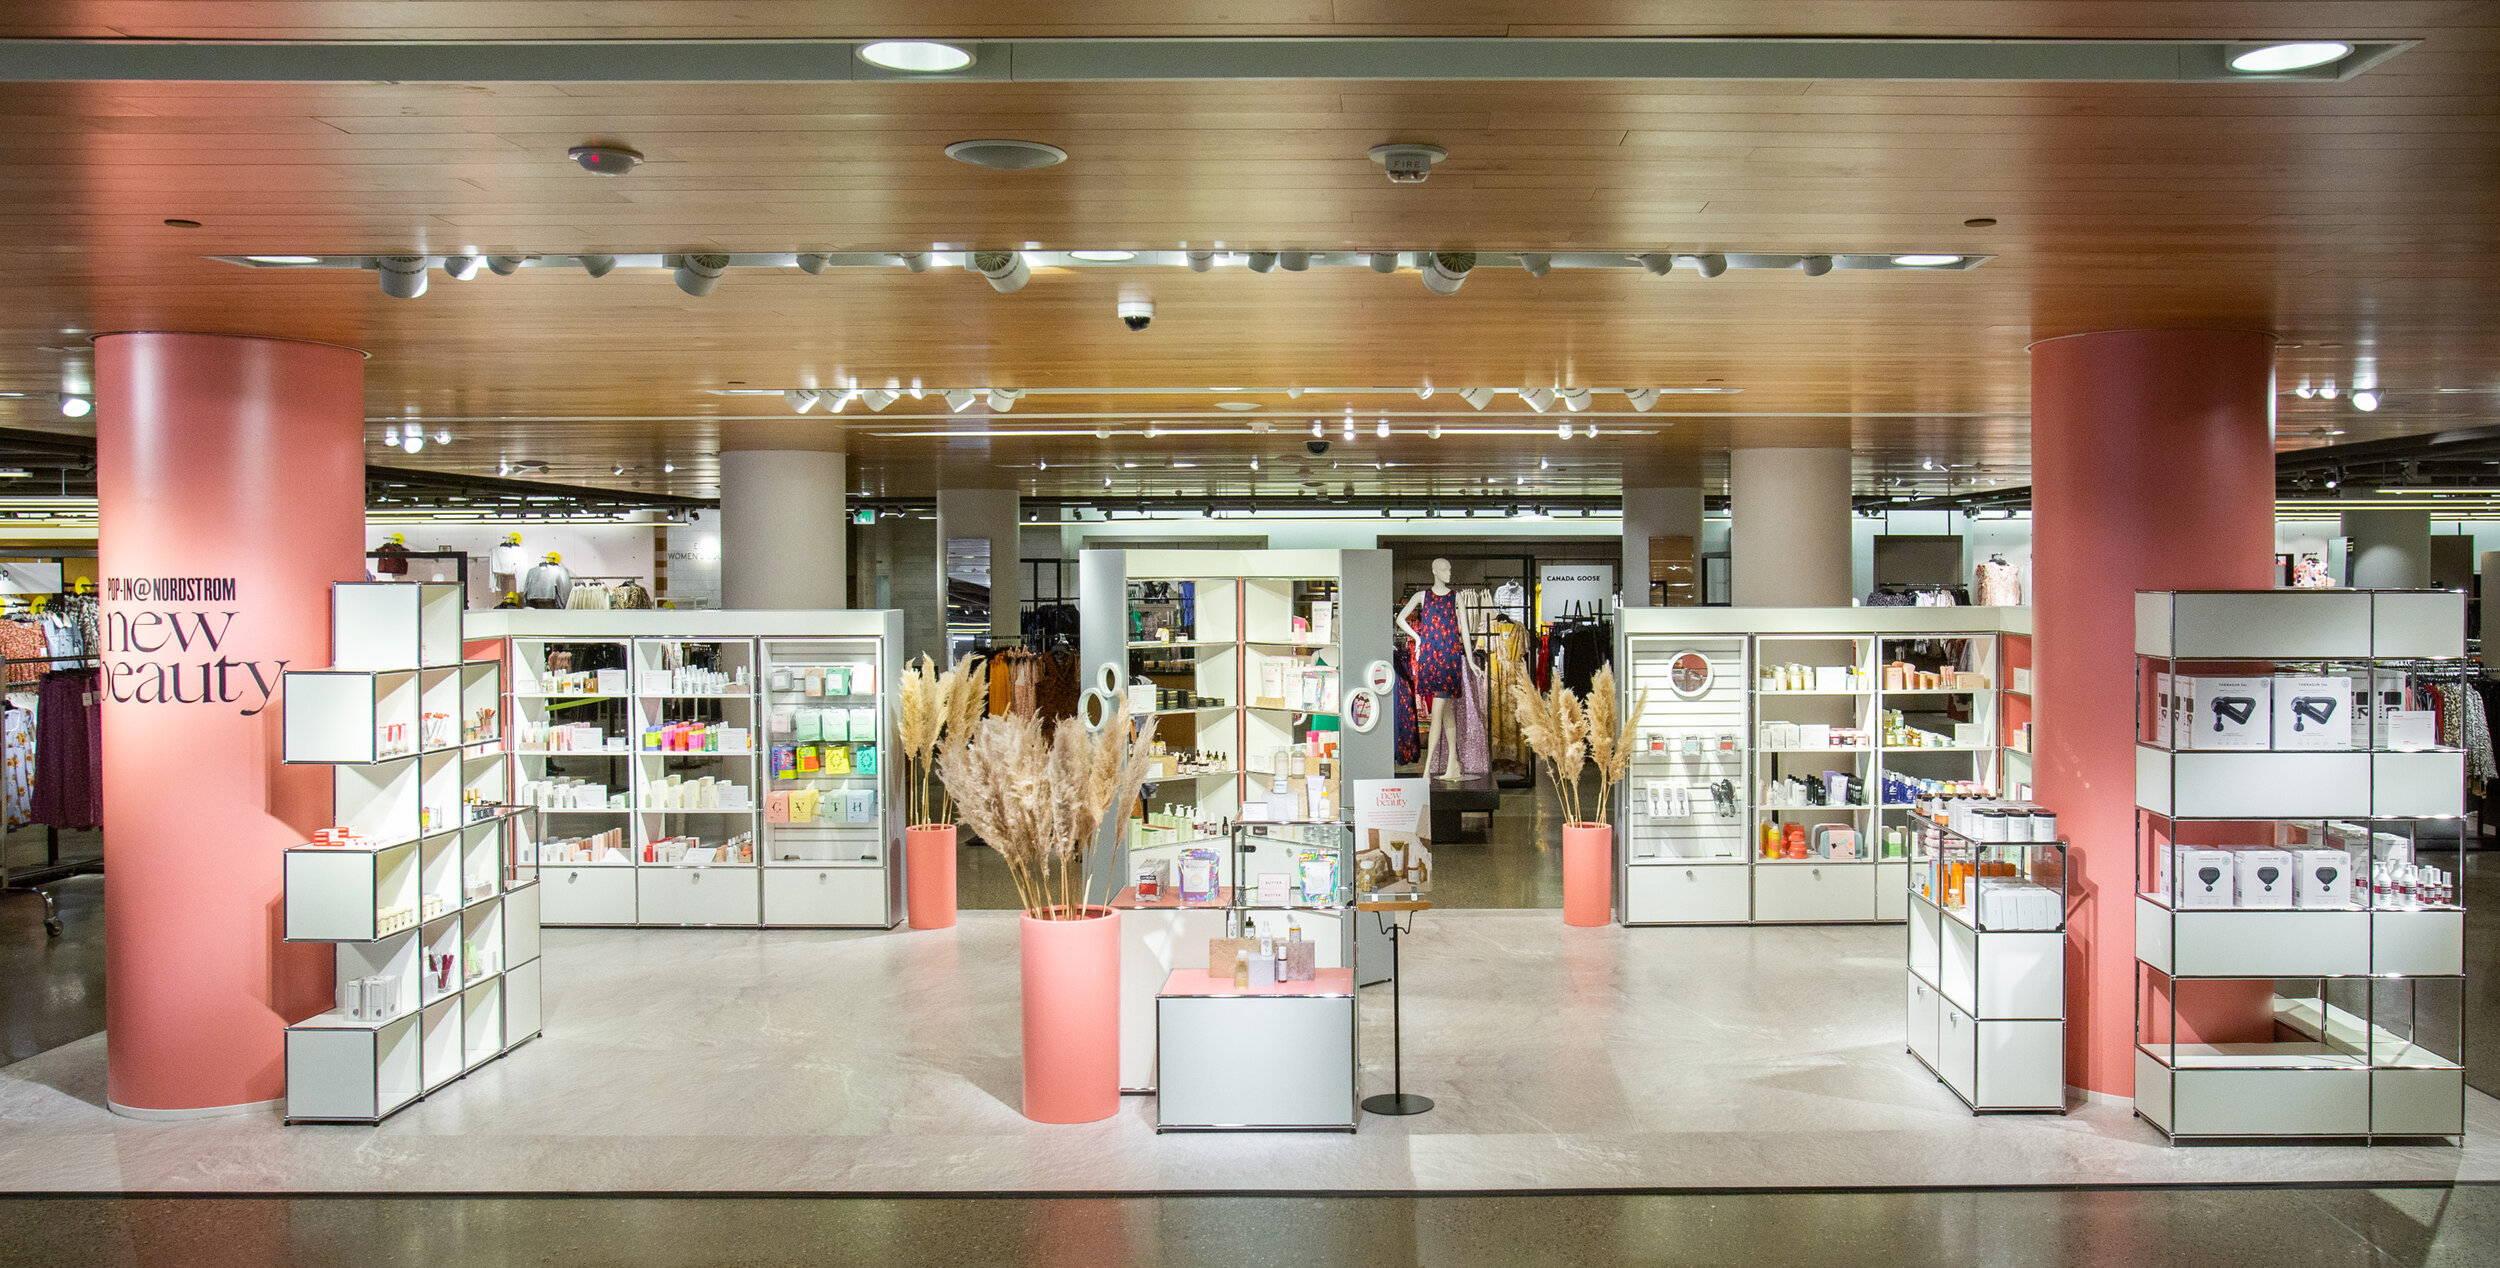 nordstrom-shop-popin-beauty-wellness-collagen-supplement-brands-wholydose